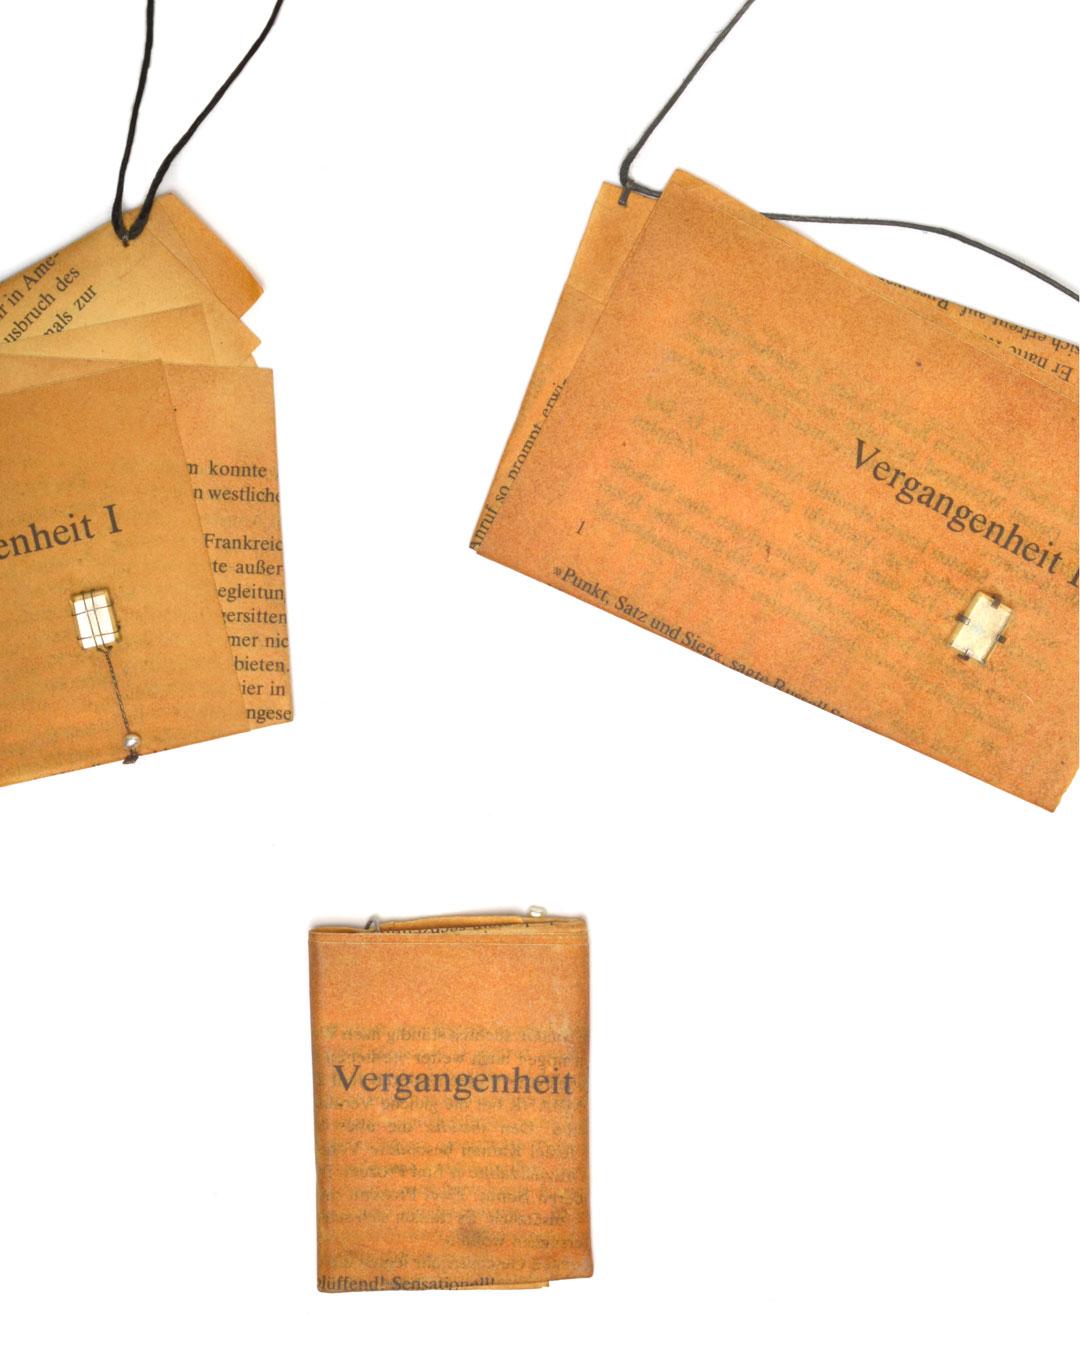 Ute Eitzenhöfer, Vergangenheiten (Pasts), 1996, two pendants and a brooch; paper, aquamarine, soft steel wire, 140 x 100 x 3 mm; 130 x 85 x 3 mm; 75 x 53 x 4 mm, €2000